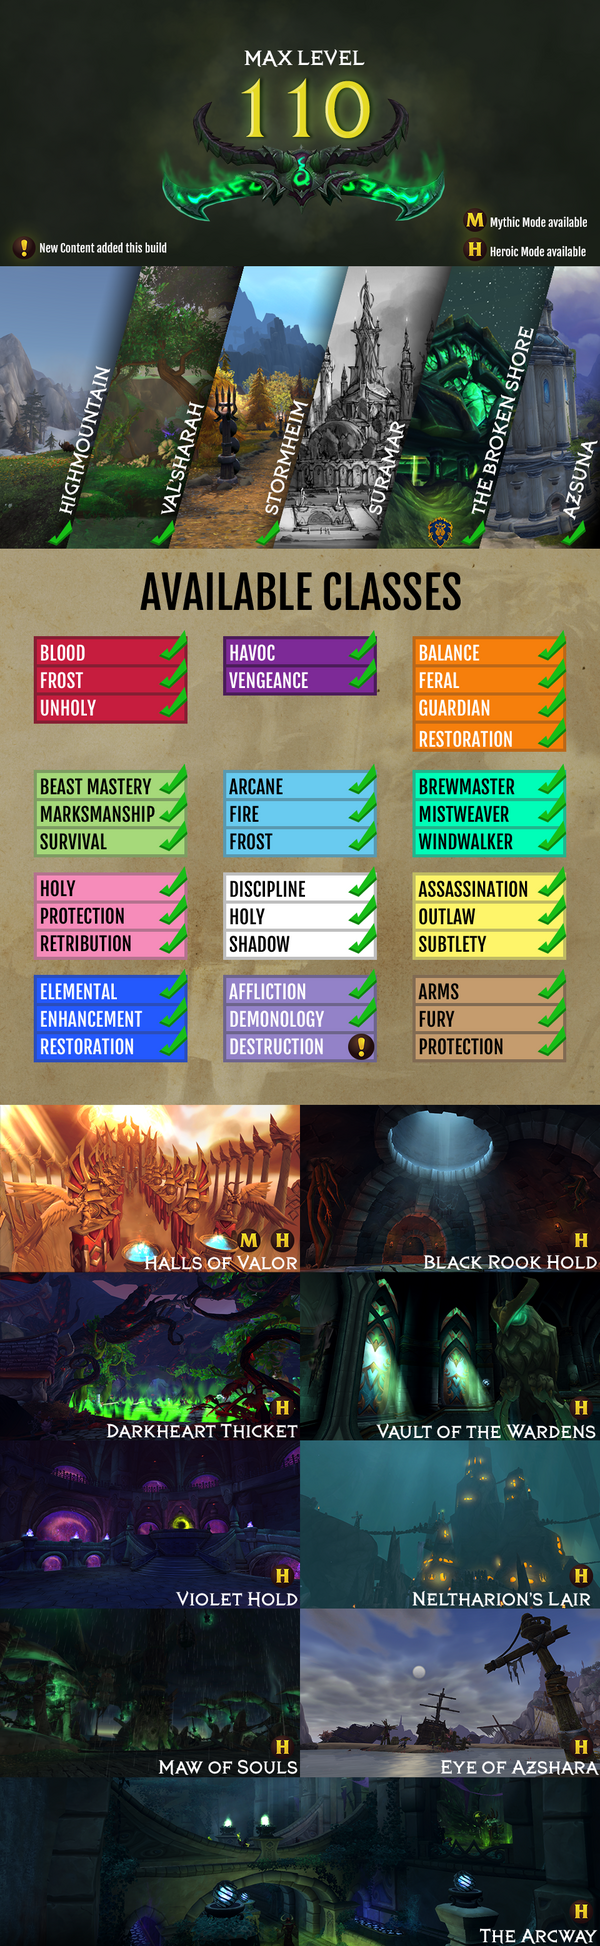 Legion Alpha infographic 13-Apr-2016